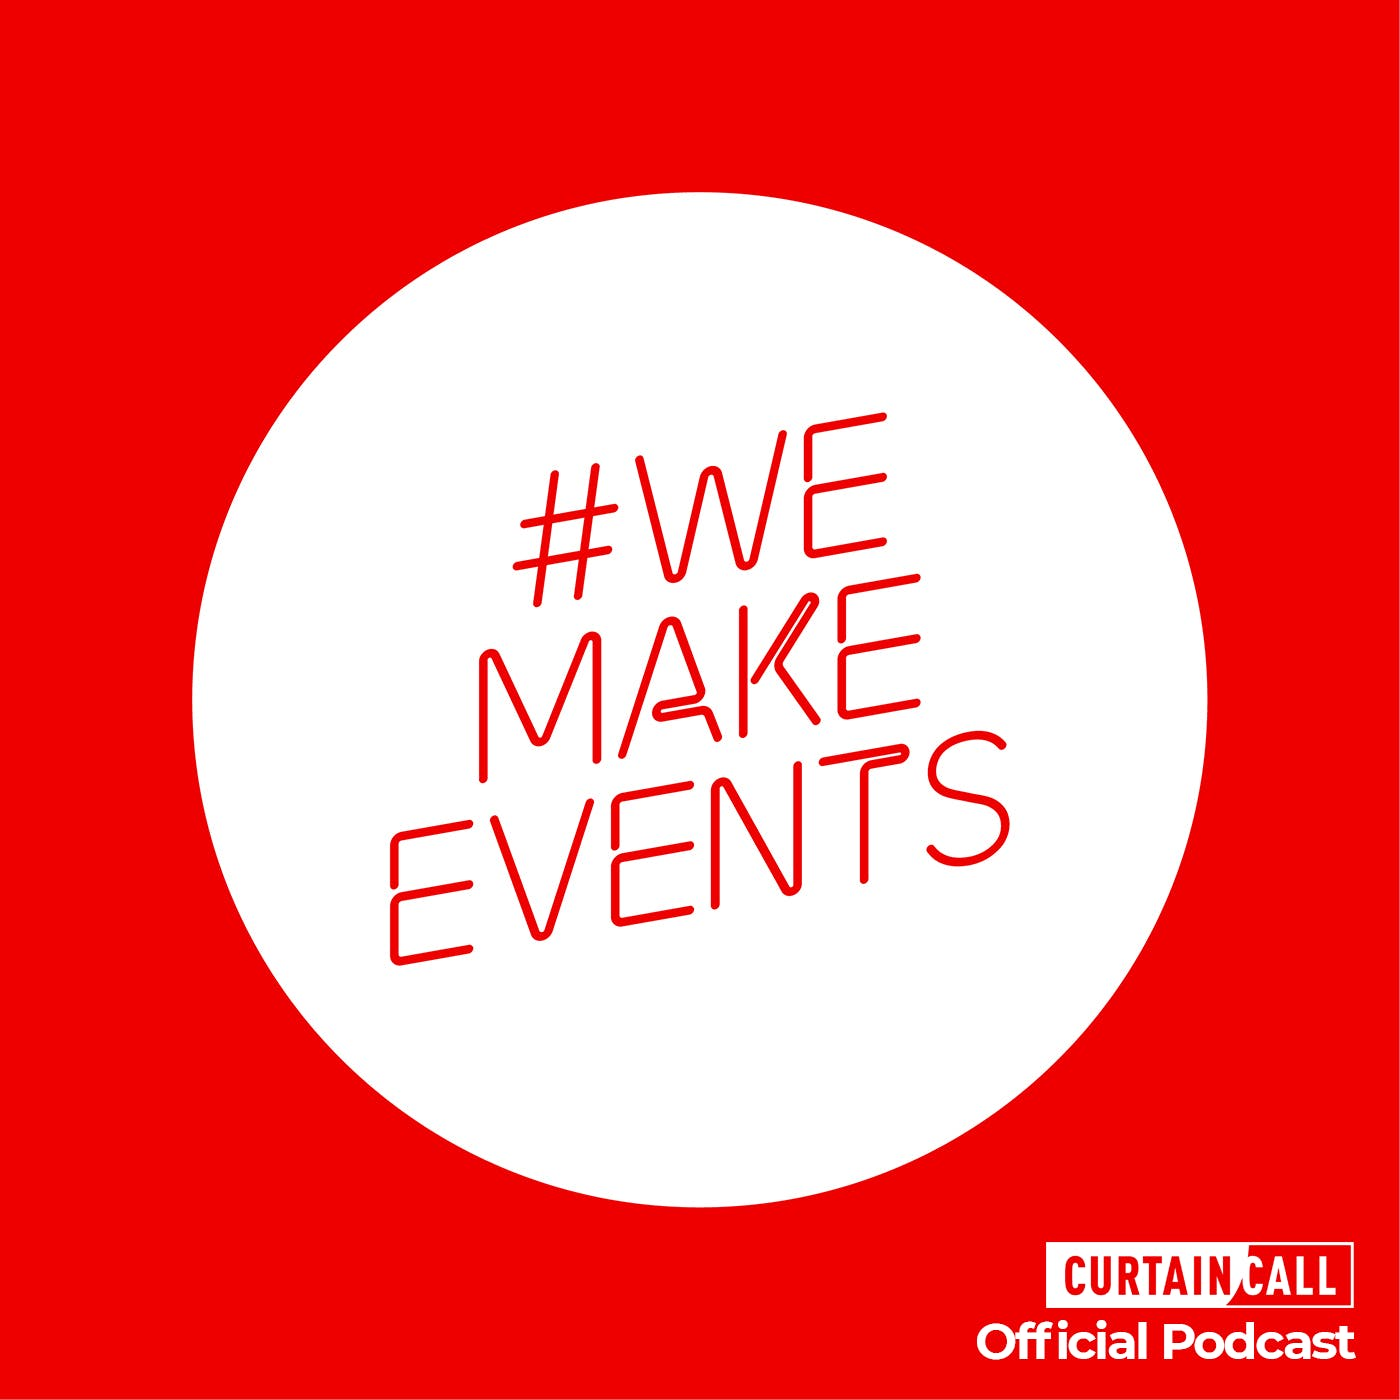 Special Episode: We Make Events